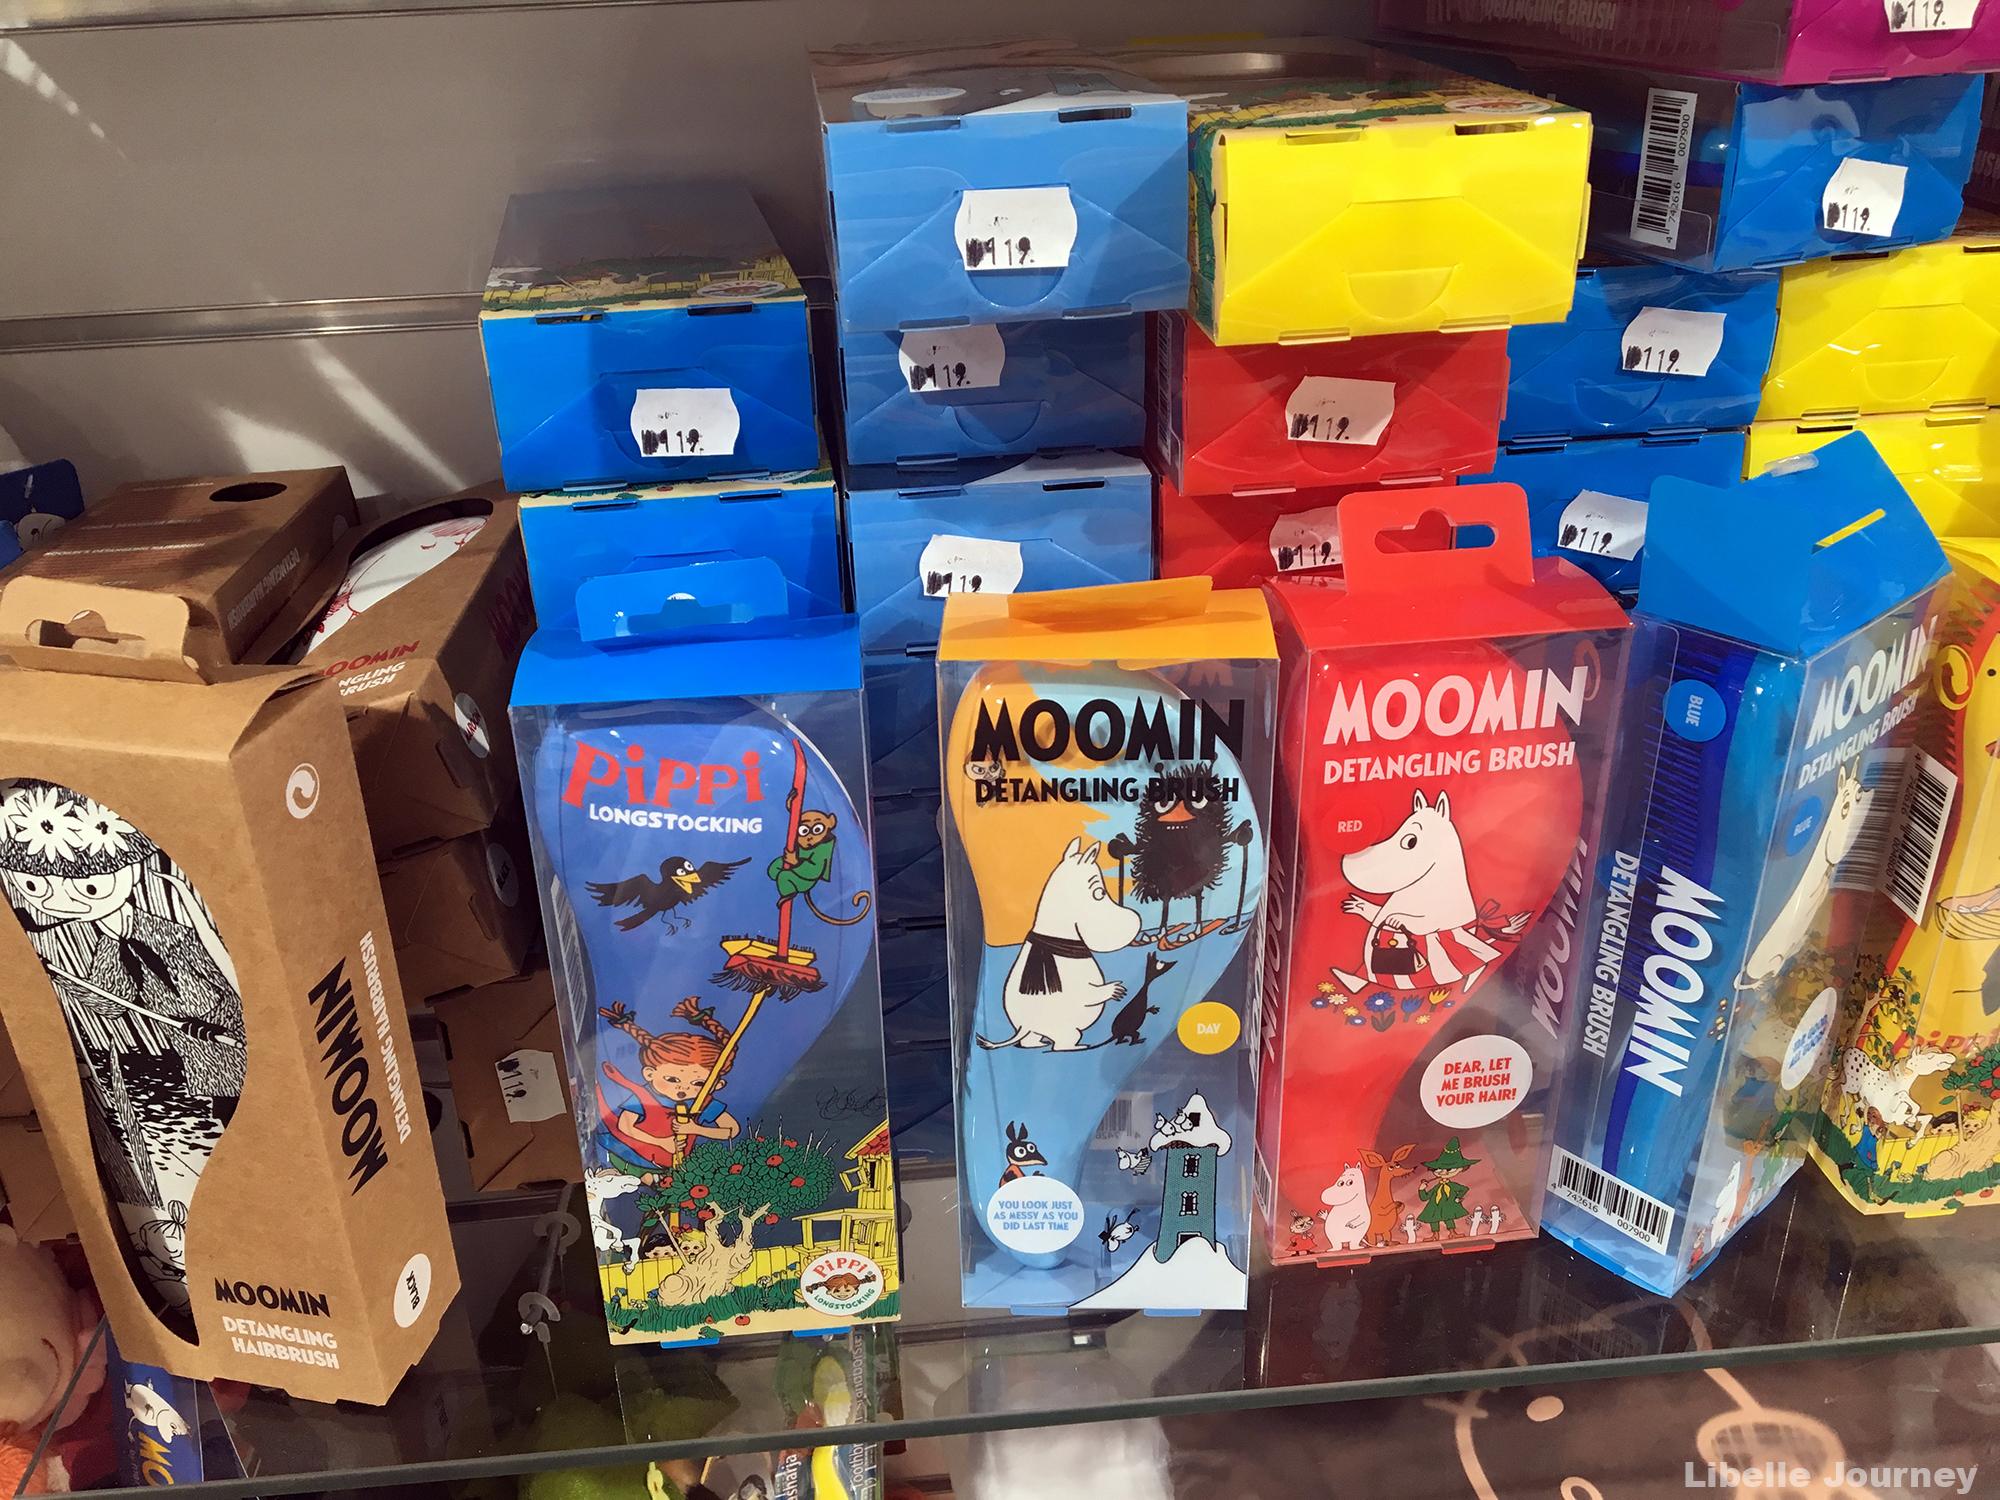 Moomin souvenirs